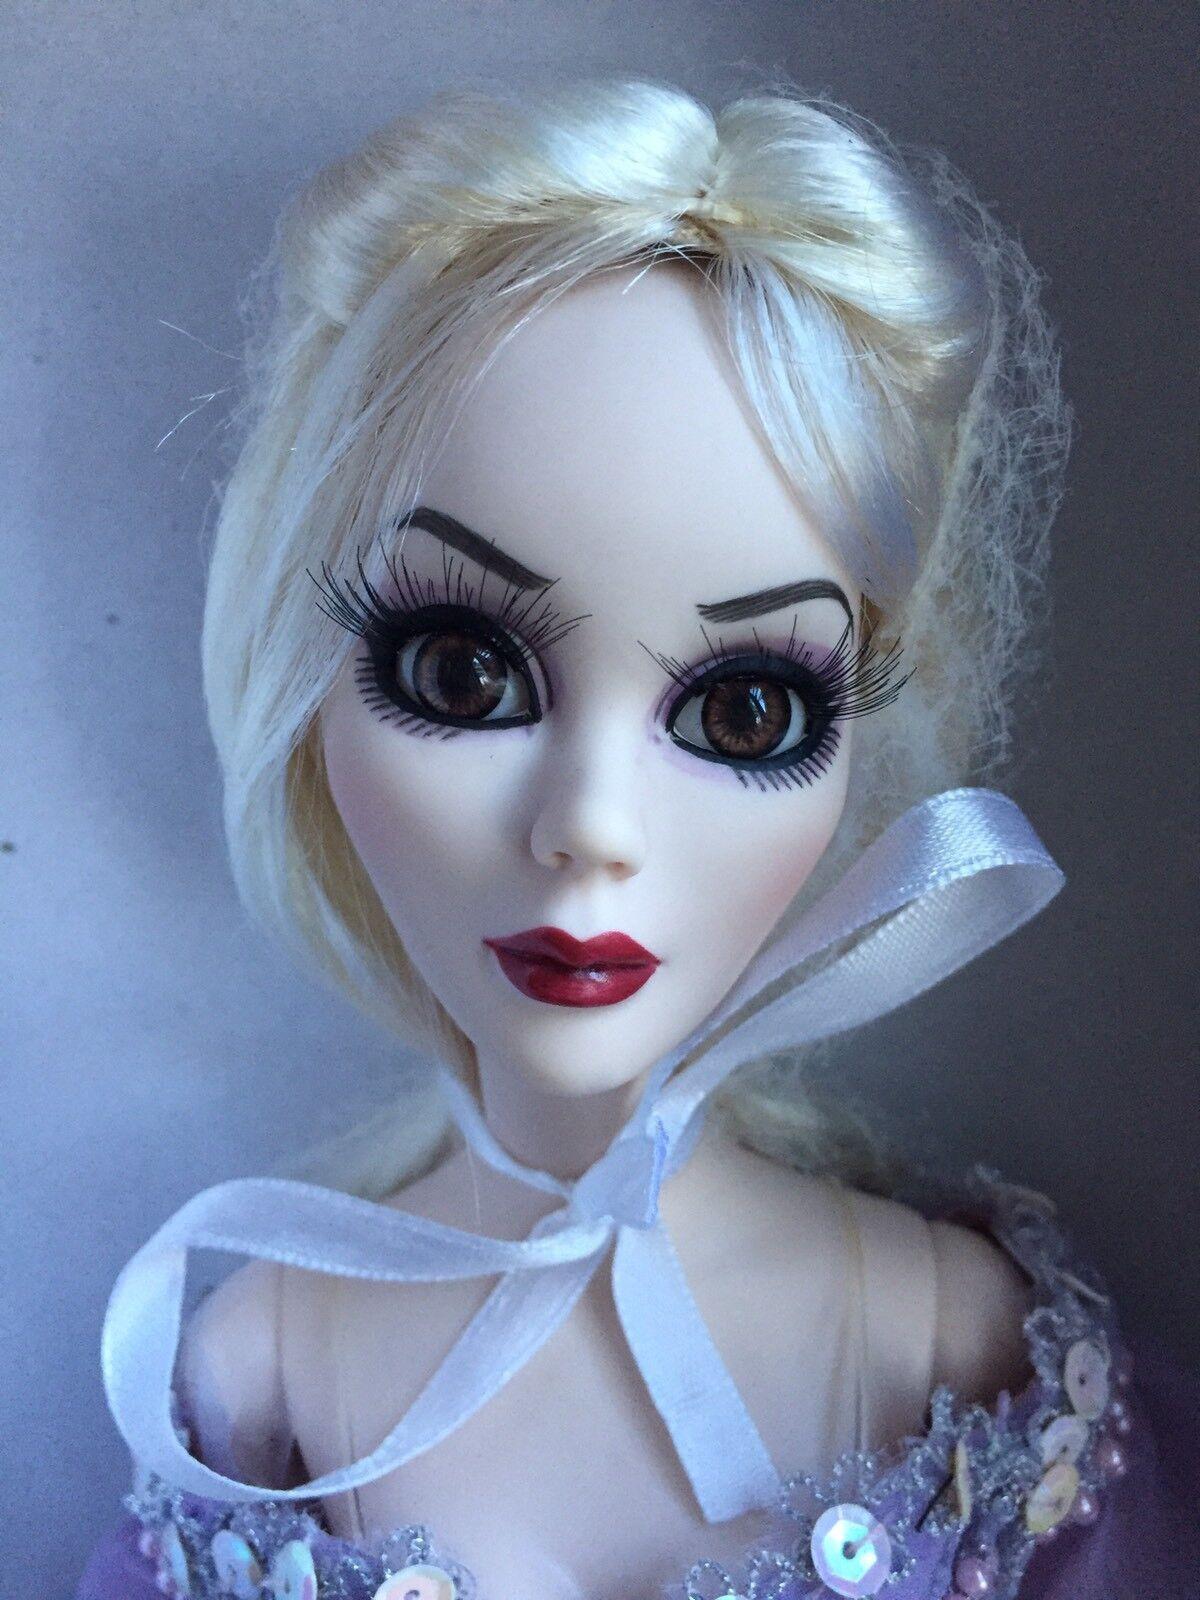 Tonner Wilde Imagination Evangeline Orribile Gotico Mist 18.5   Bambola Fashion